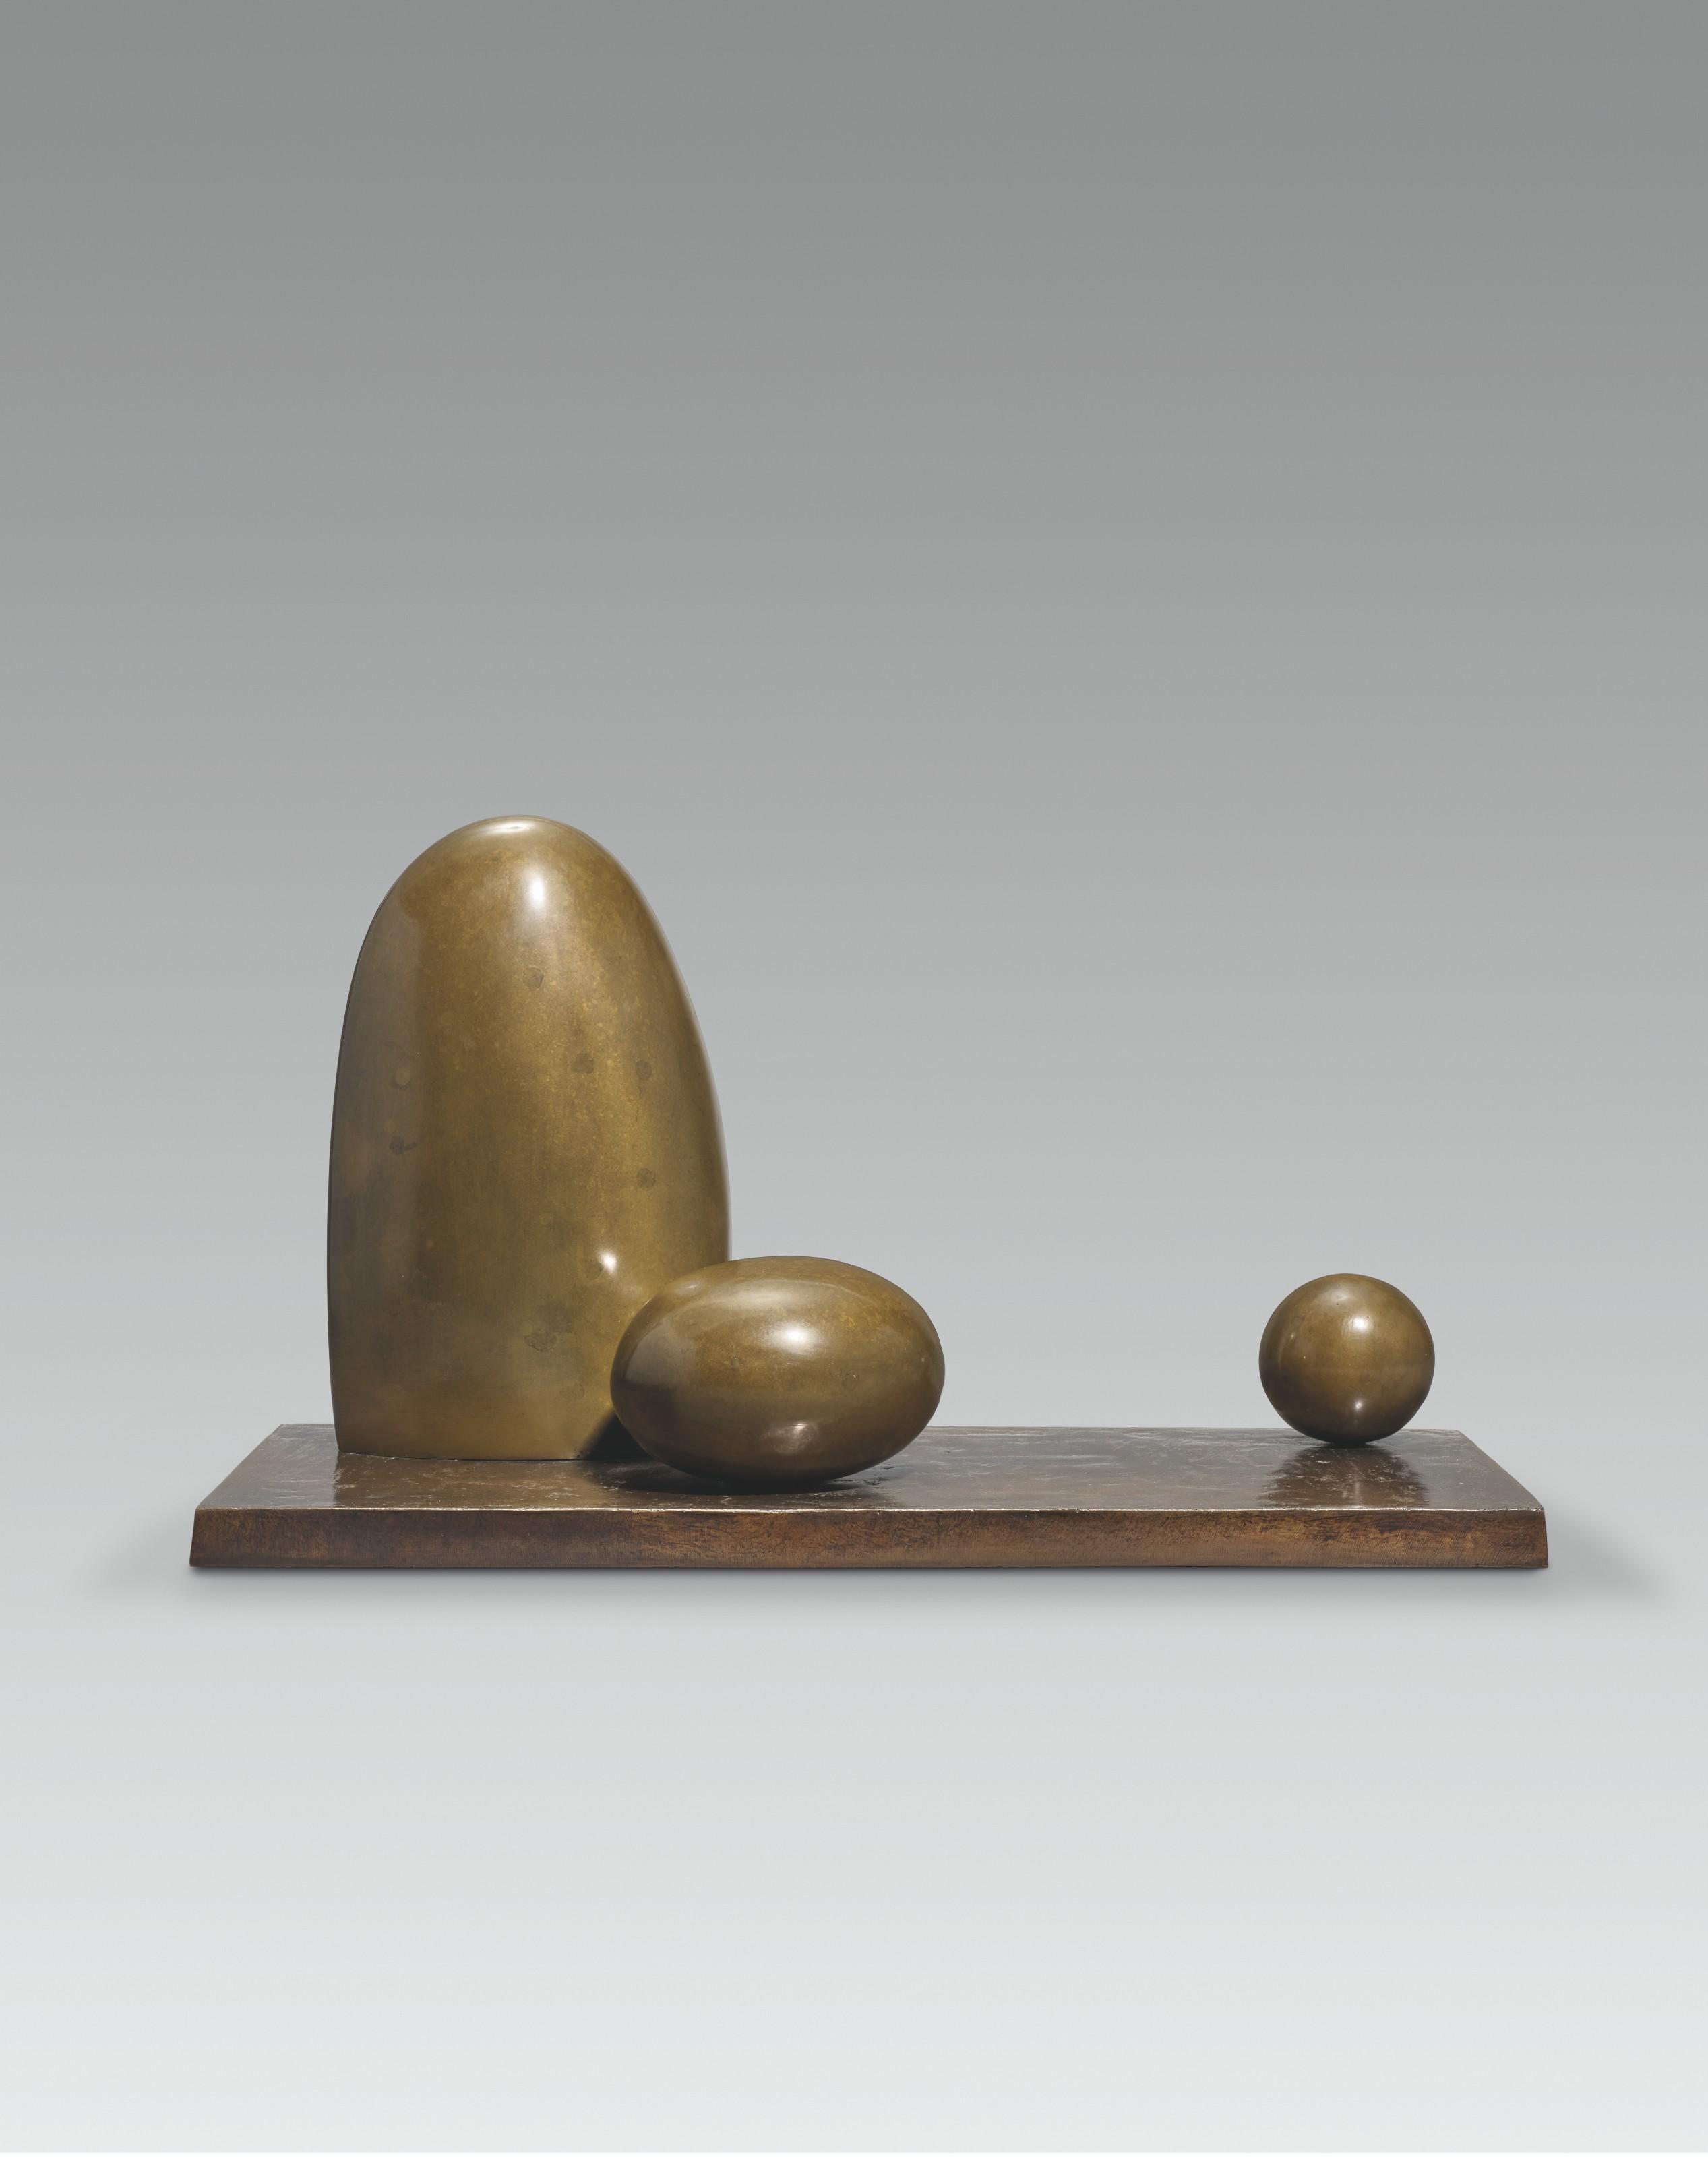 Dame Barbara Hepworth (1903-1975), Three forms, 1971. Bronze. 18½  in (47  cm) wide. Estimate £150,000-250,000.Offered inModern British and Irish Art Evening Saleon 20 October 2021 at Christie's in London